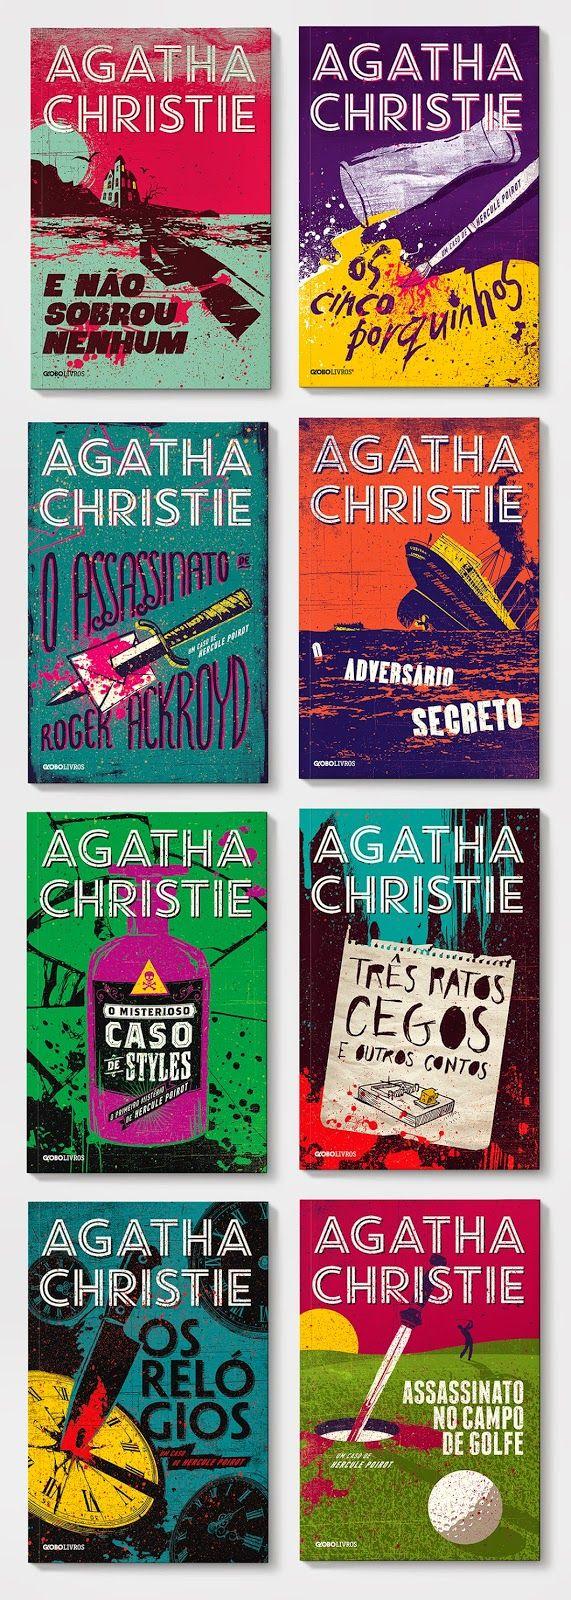 sobrecapas: Agatha Christie (Globo Livros)